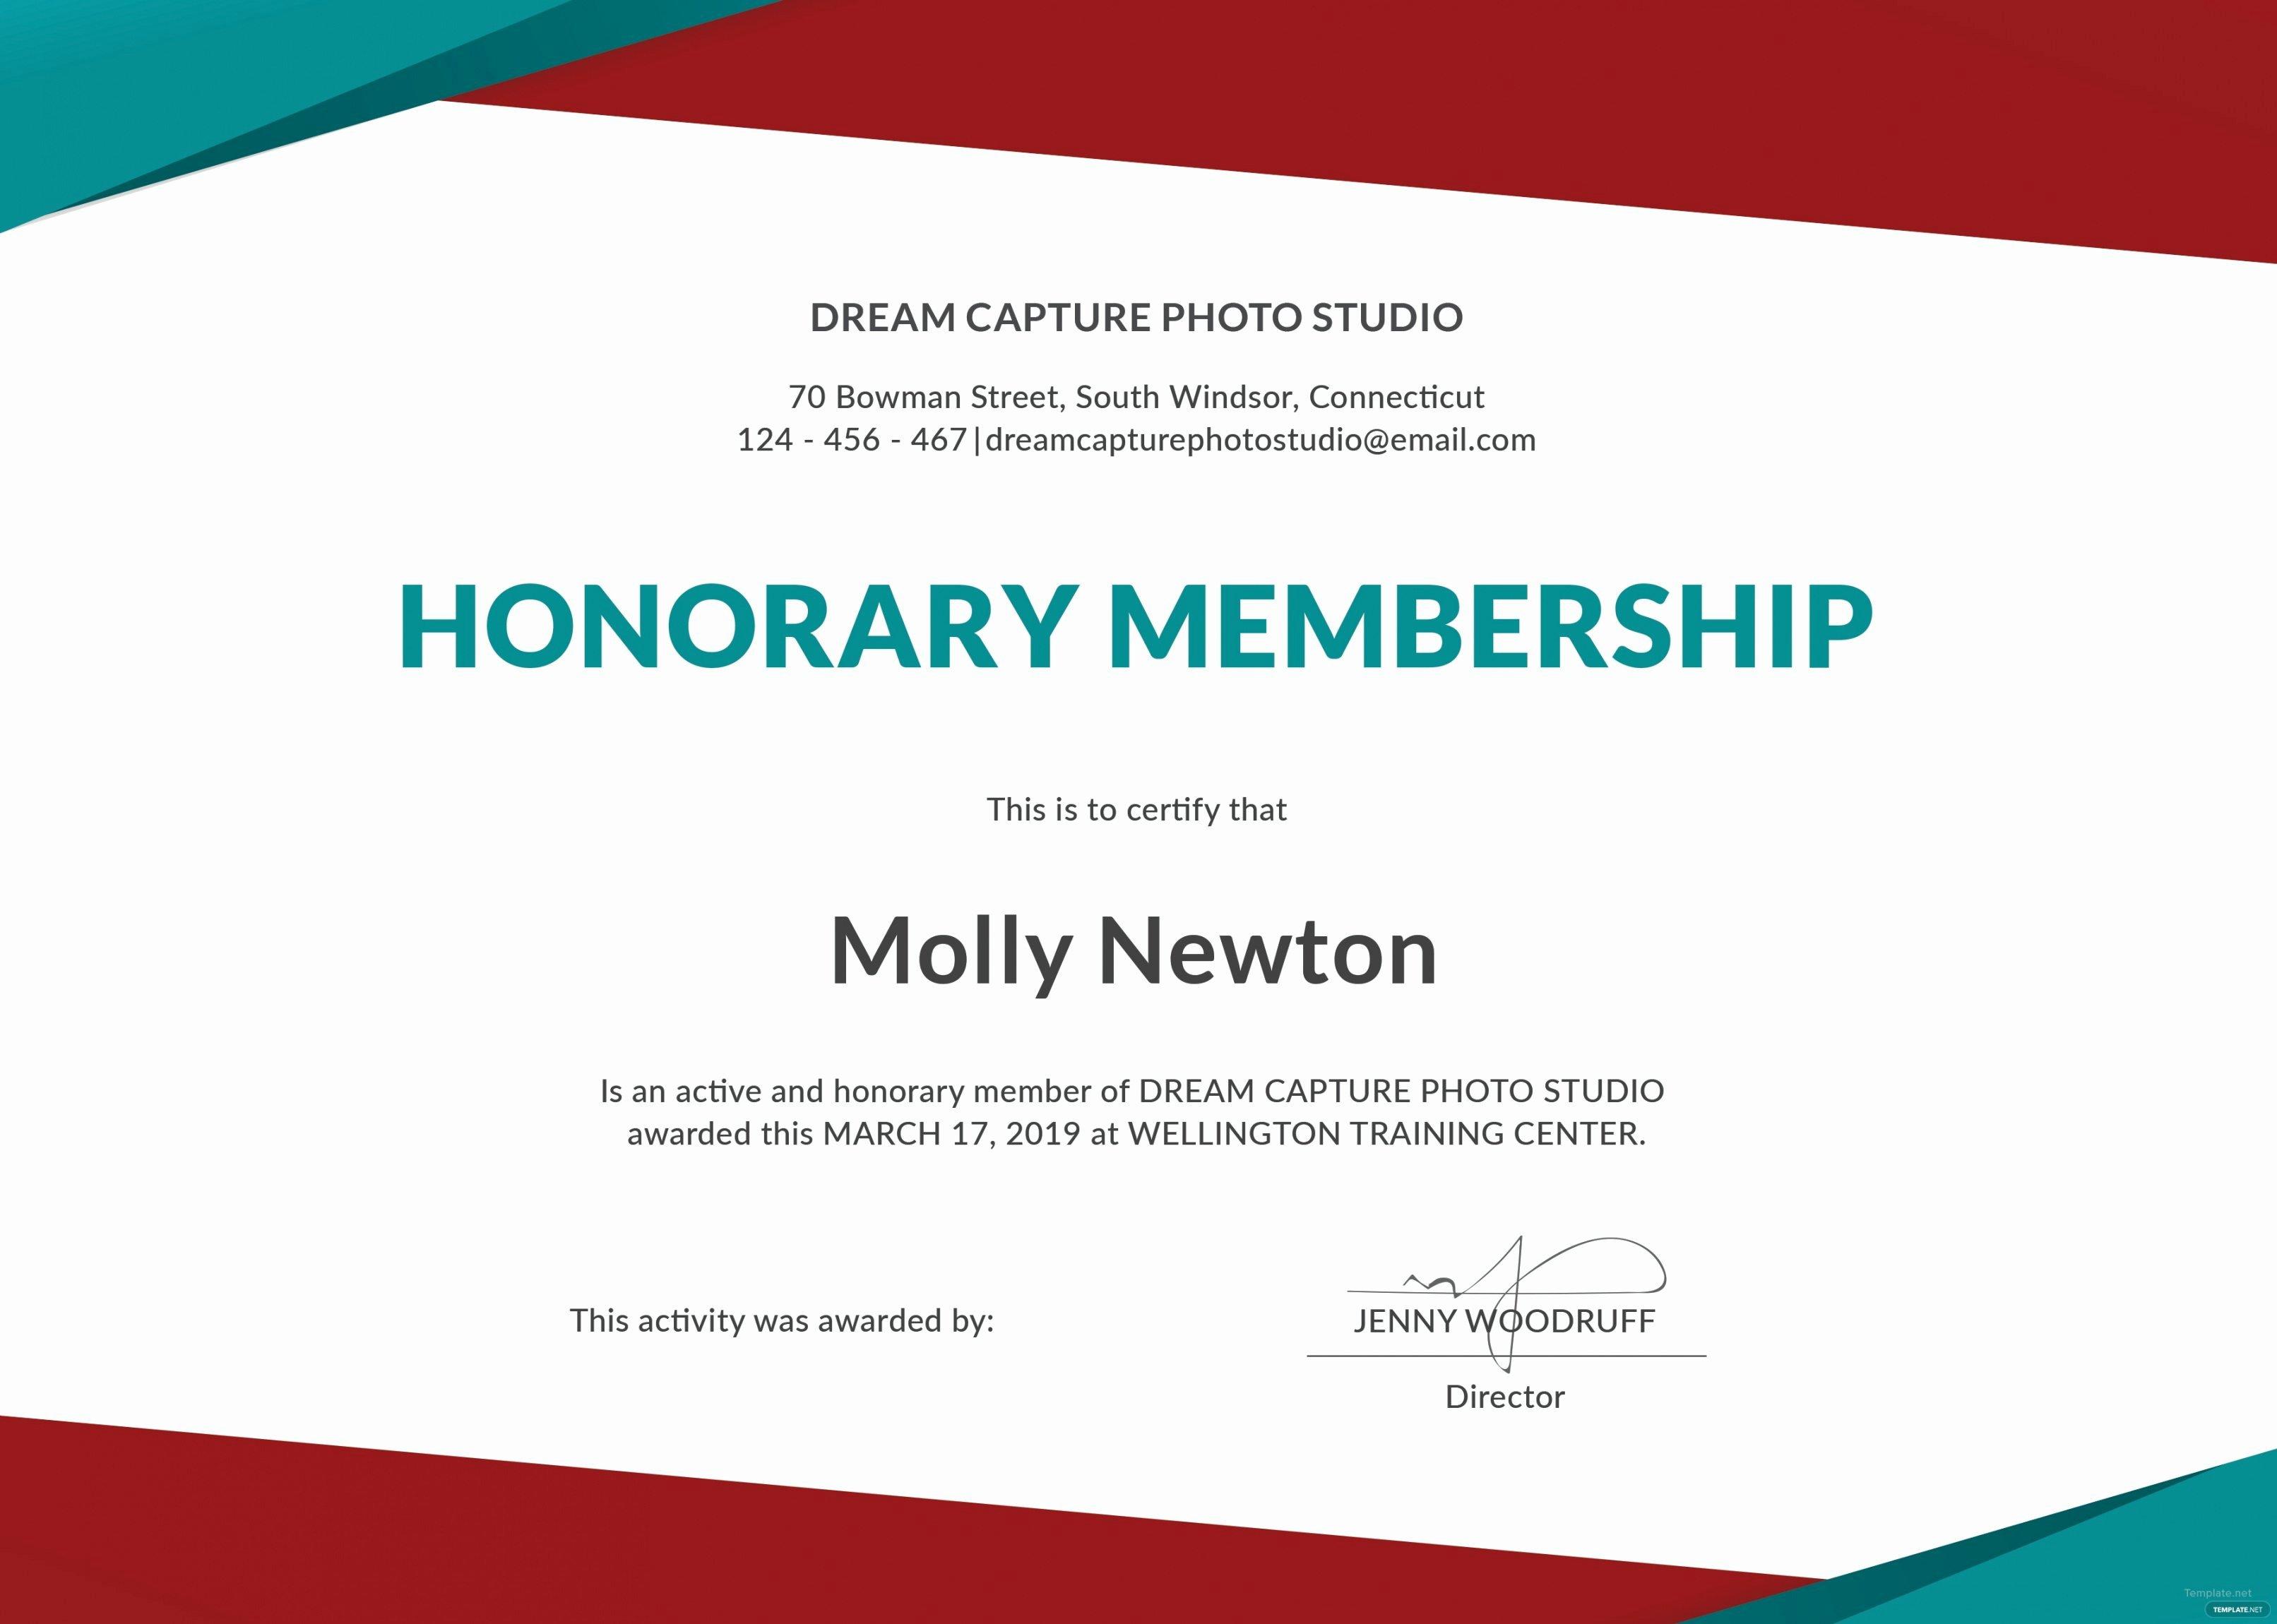 Llc Member Certificate Template Best Of Membership Certificate Template Llc New Church Member Word